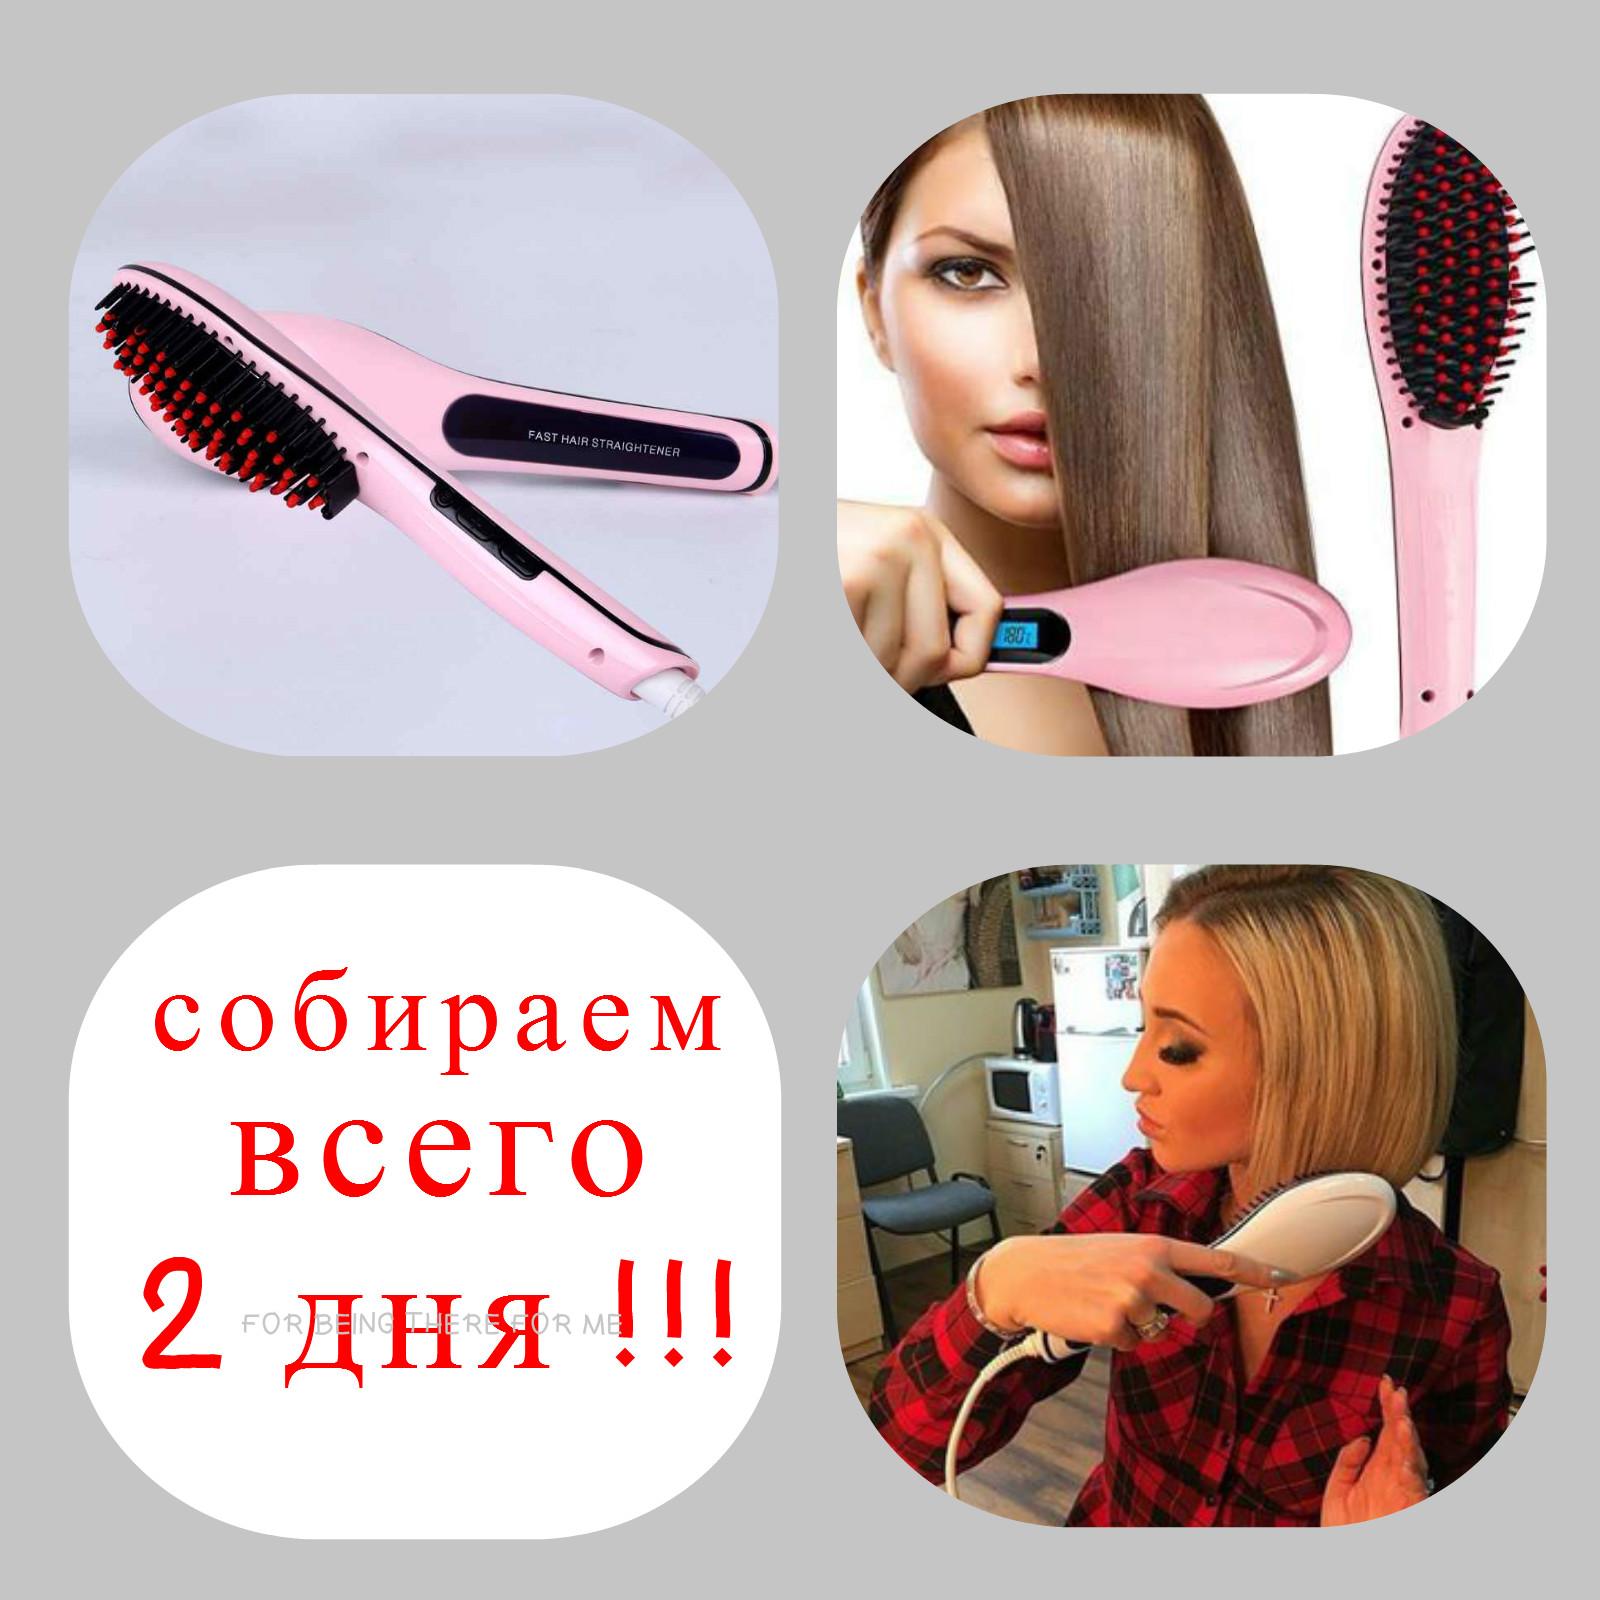 ������������� �������! ����� 2 ���! ������� ����� ������! �����-���! ��������-����������� Fast Hair Straightener. ������� �� 5 �����!���� 3